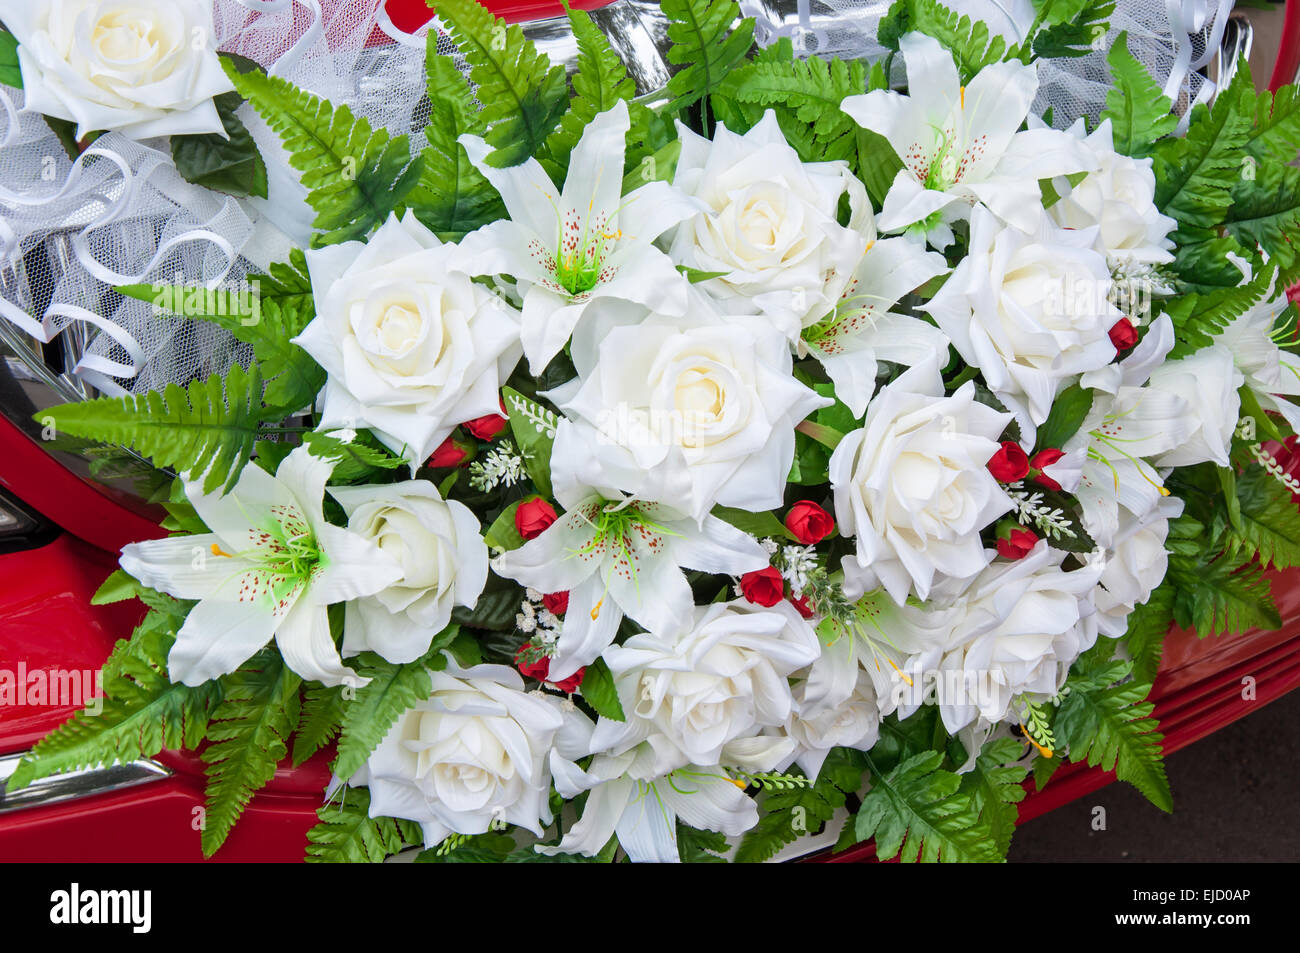 Wedding car flowers decoration among the many decorations of the wedding car flowers decoration among the many decorations of the car the most common are flower arrangements izmirmasajfo